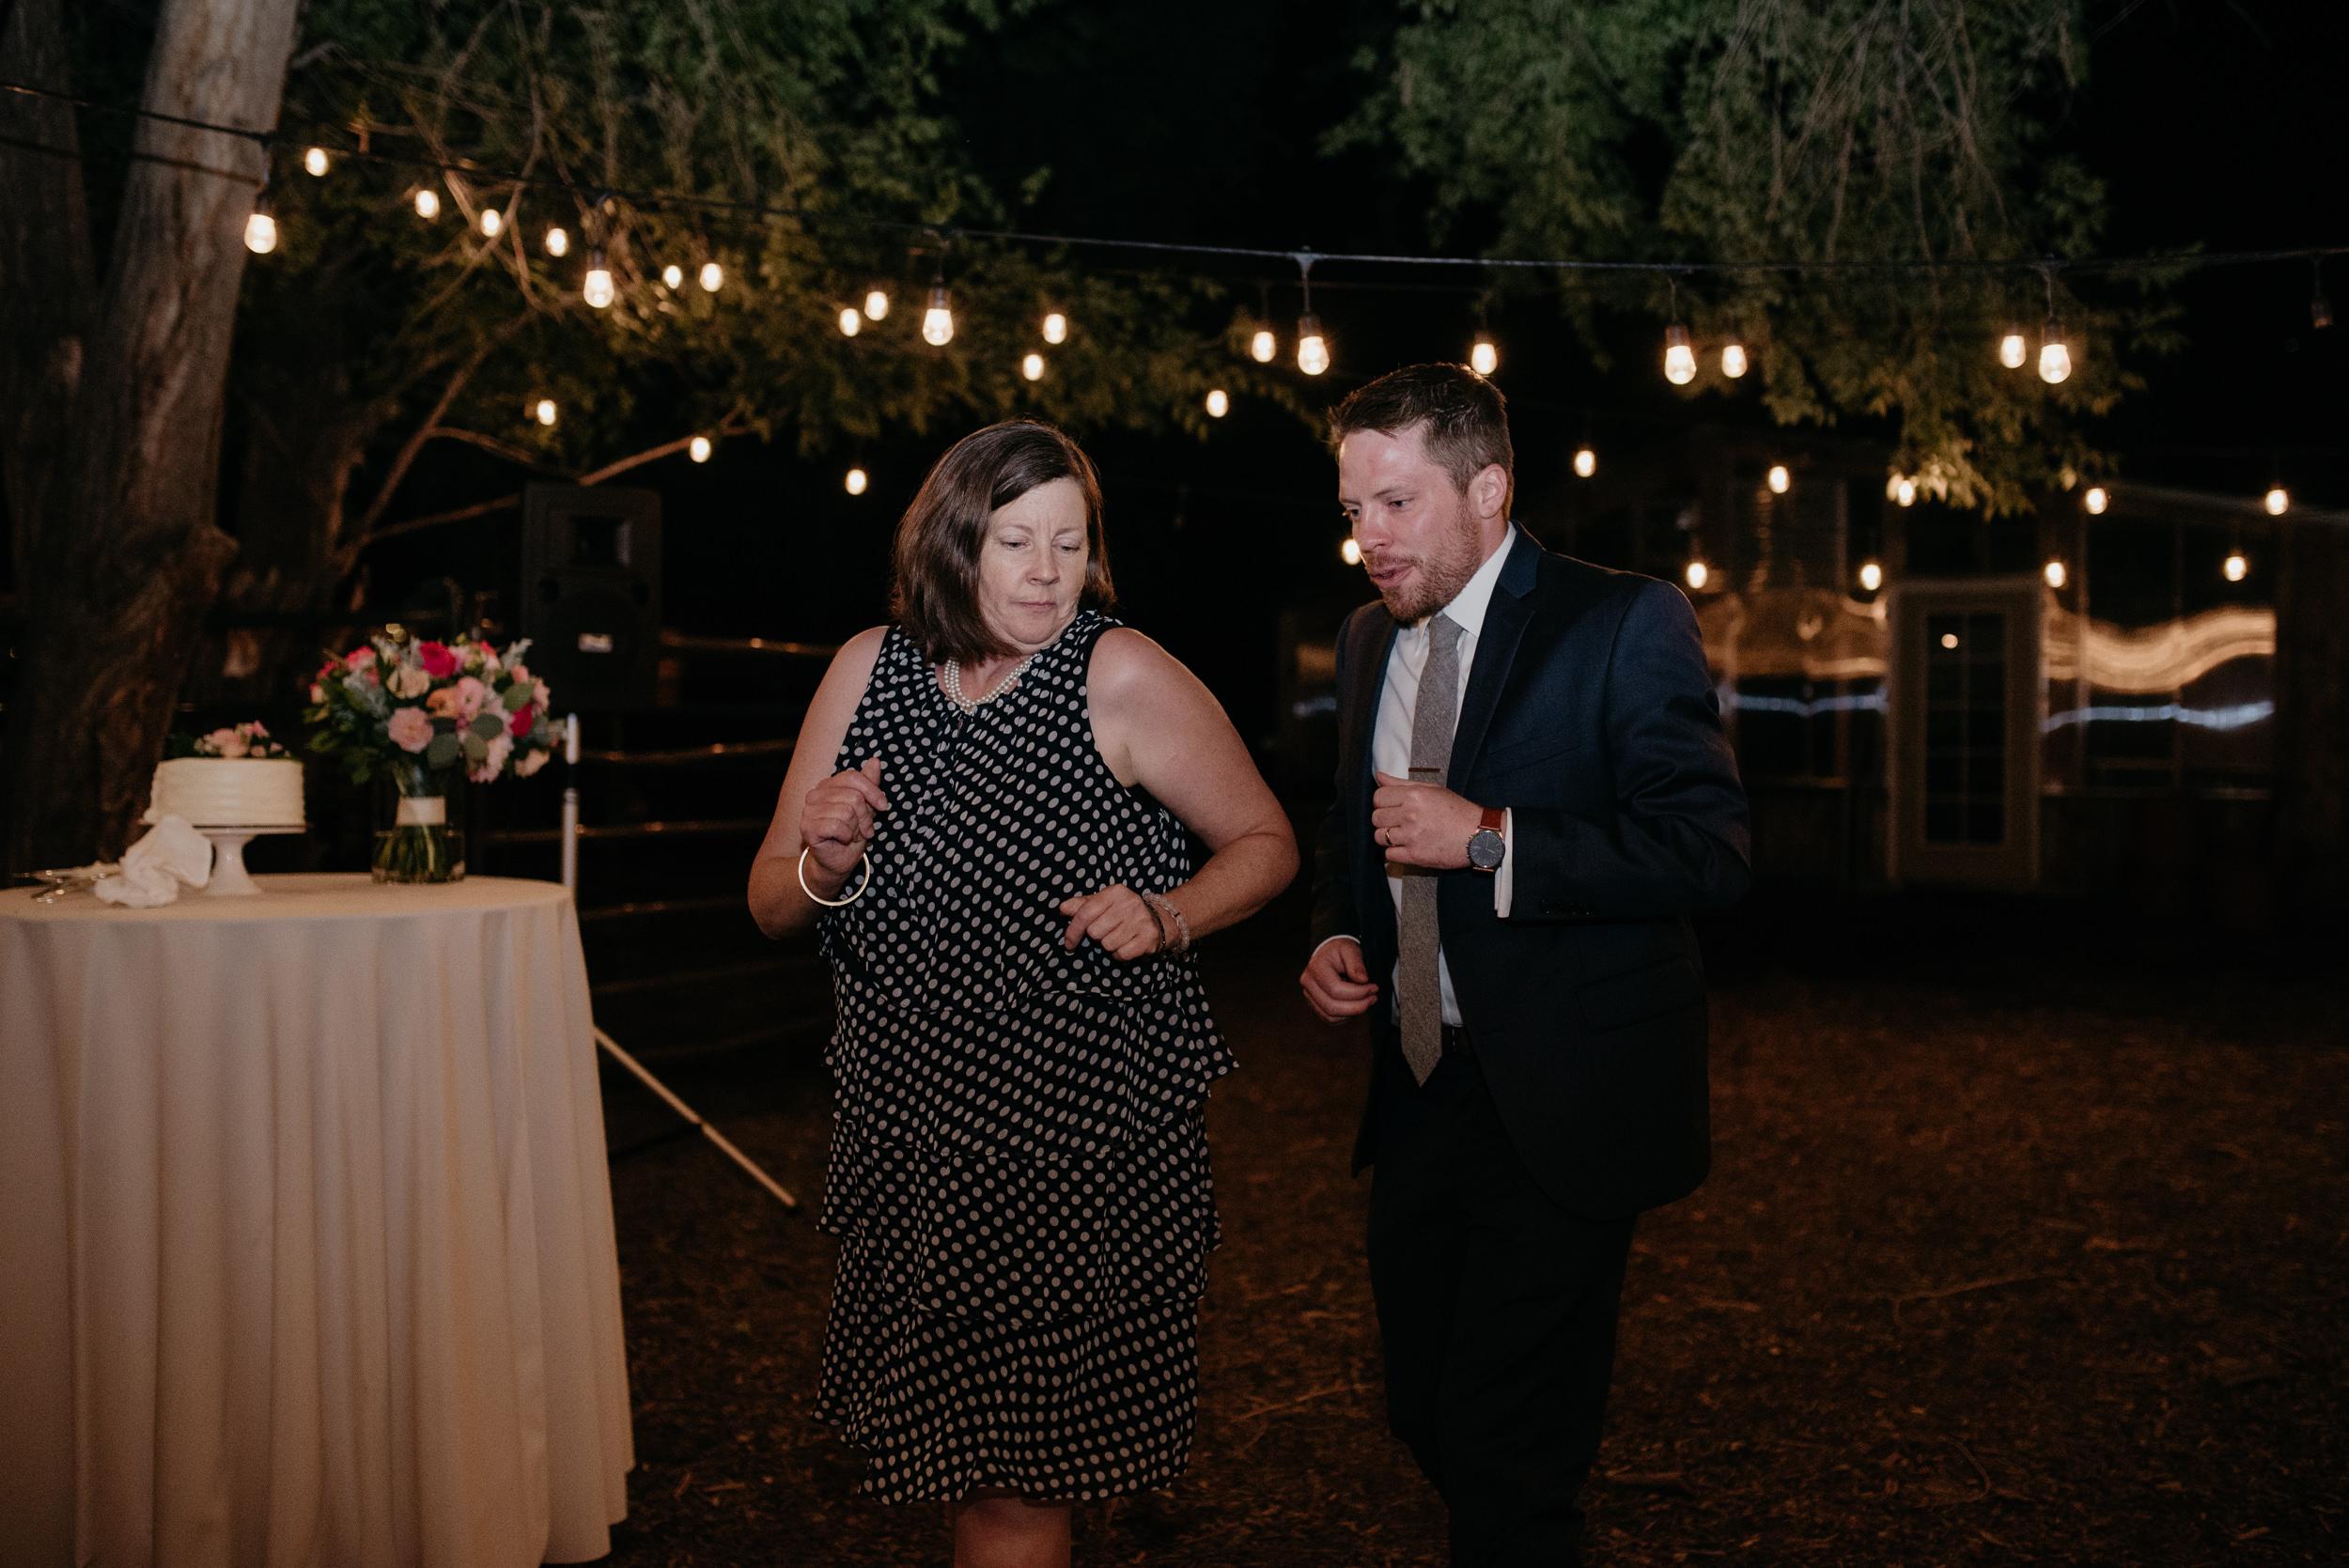 Mother and son dance at reception. Colorado wedding photographer.